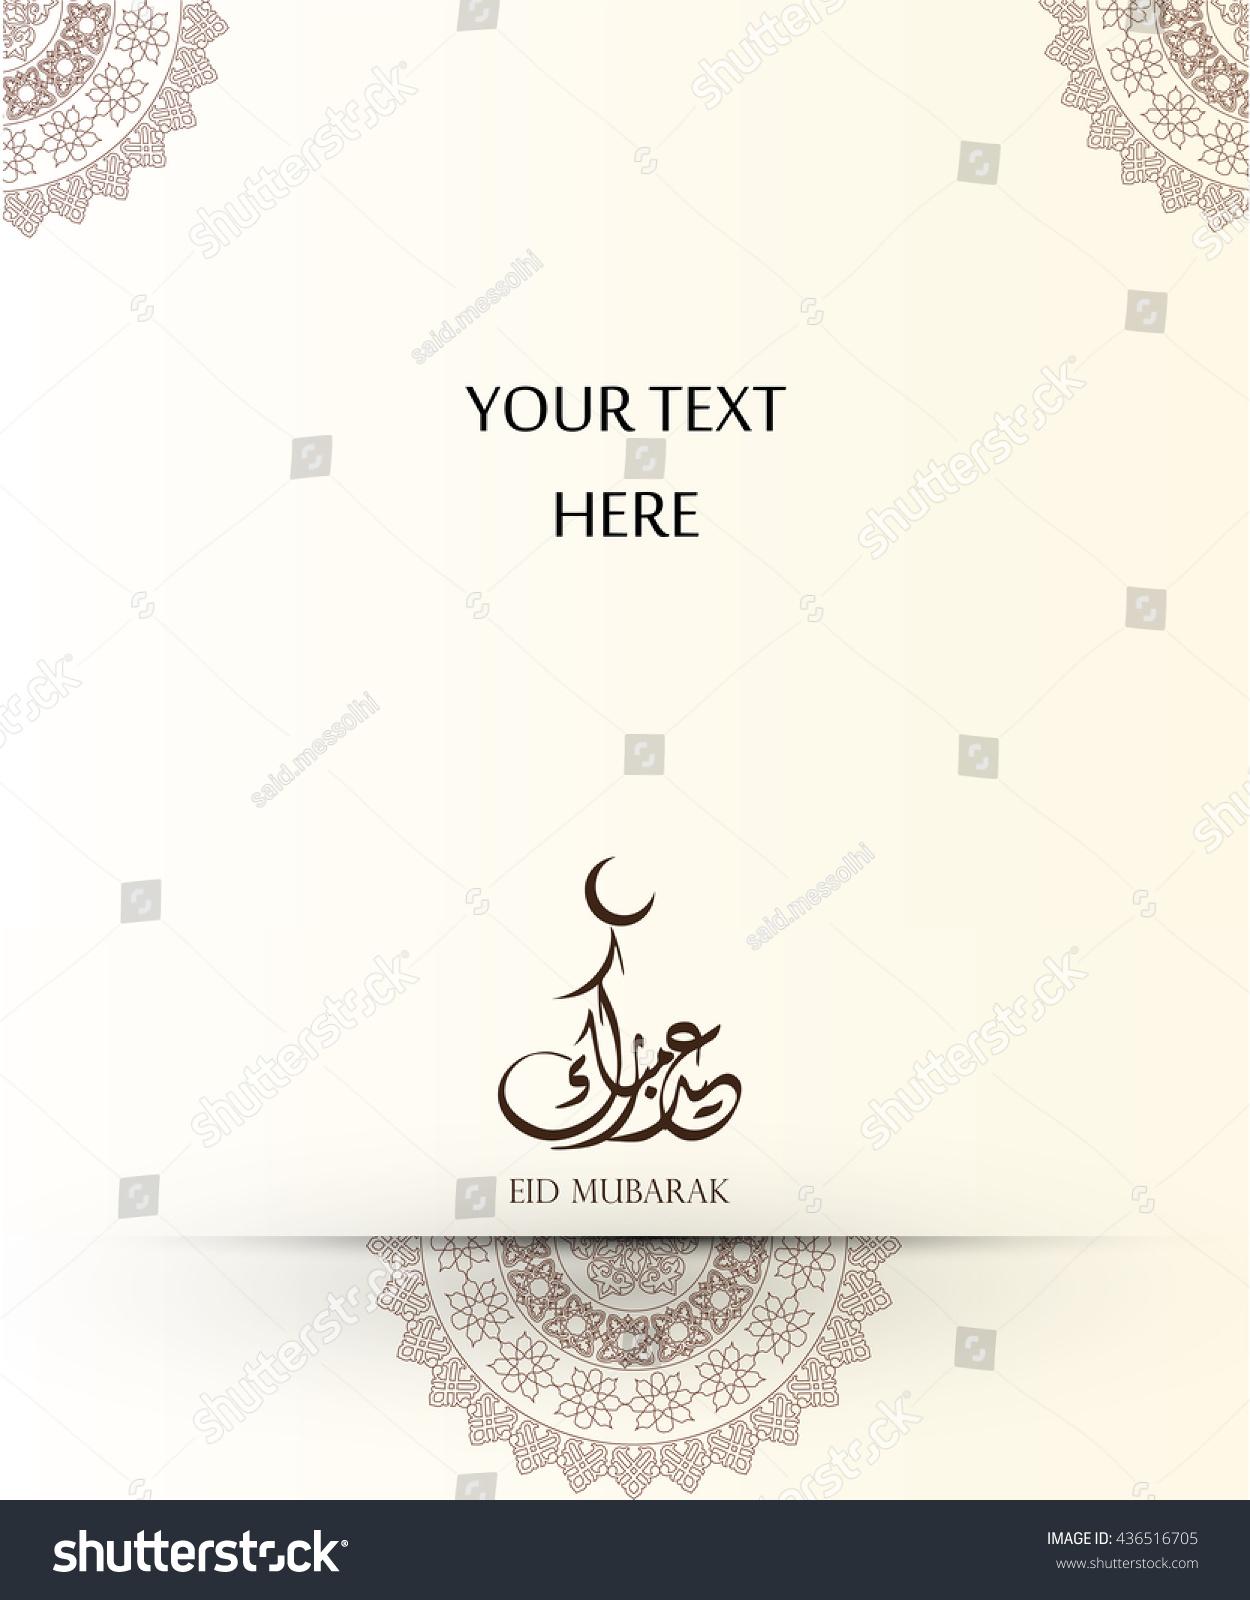 Eid mubarak wishes 2016 eid mubarak stock vector royalty free eid mubarak wishes 2016 eid mubarak messages greetings card eid al fitr m4hsunfo